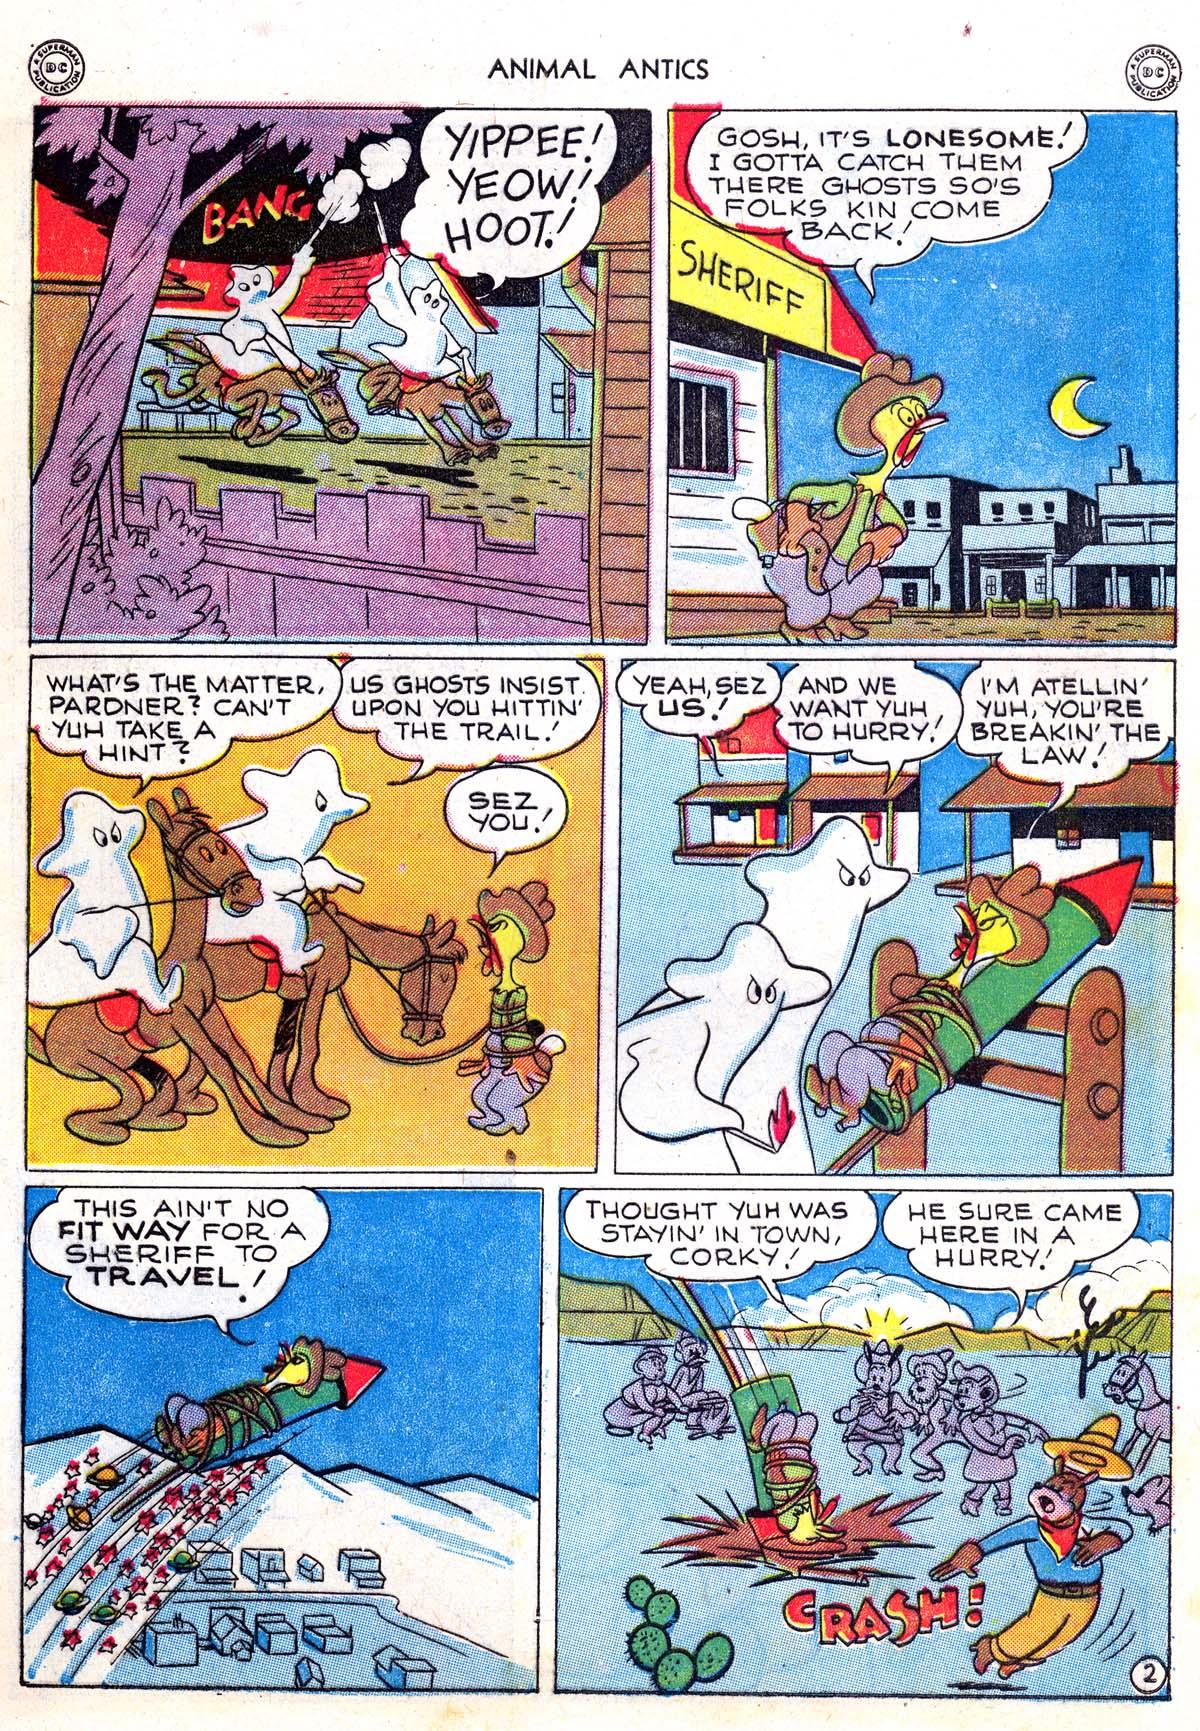 Read online Animal Antics comic -  Issue #5 - 13